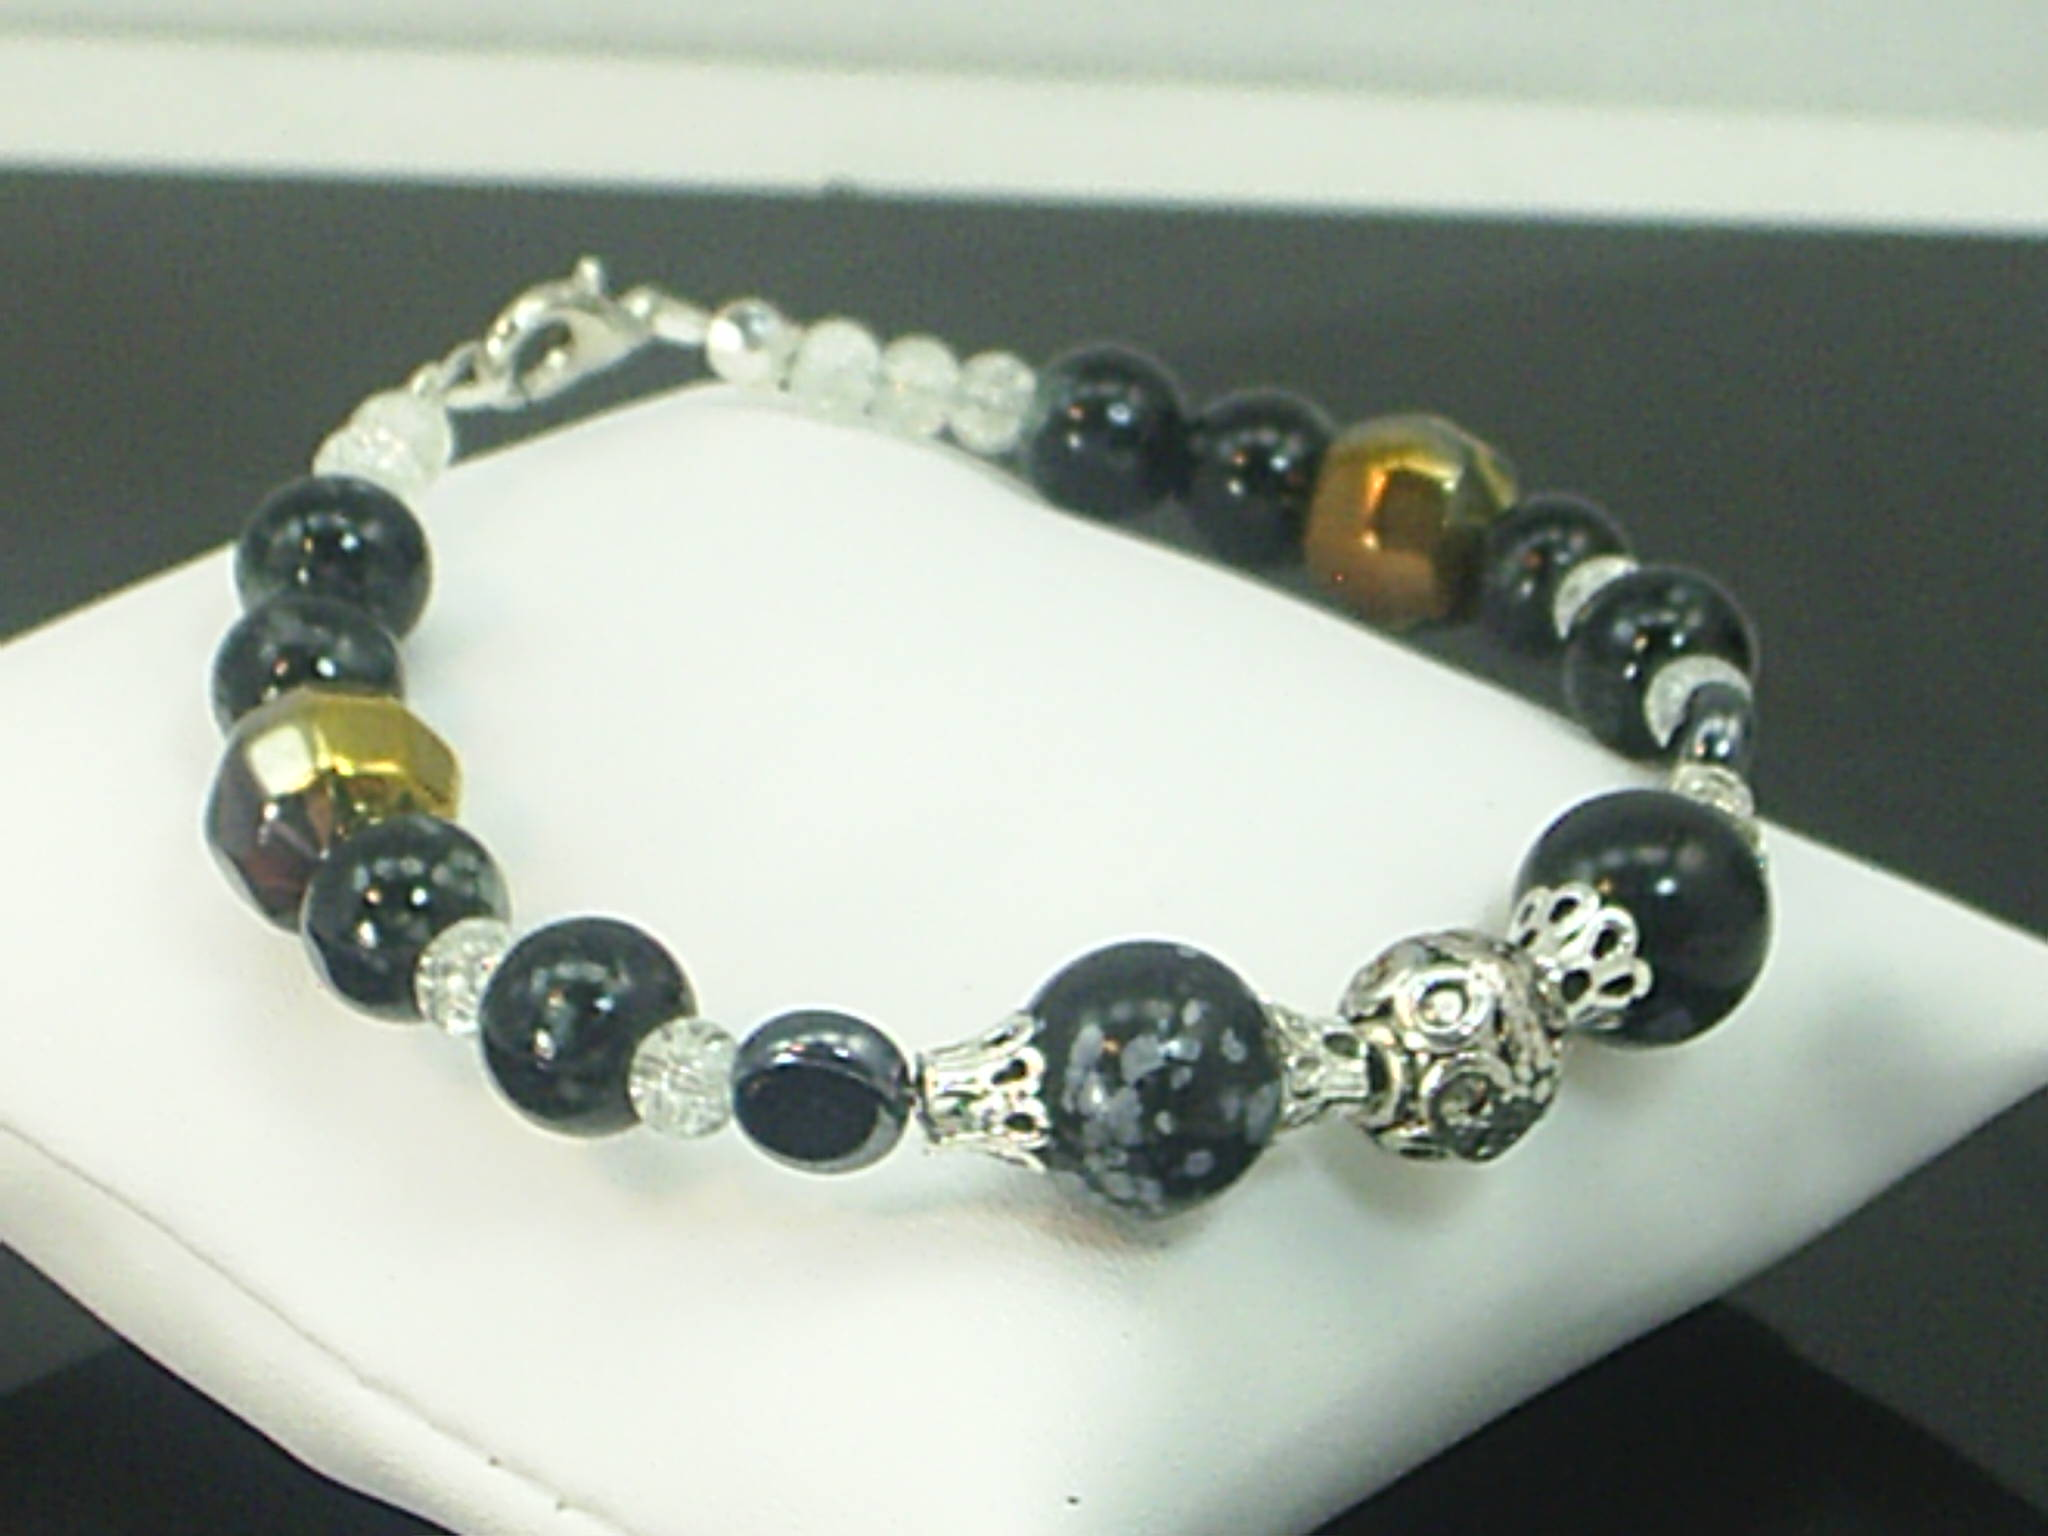 Snowflake Obsidian Gemstone Bracelet Spiritual Metaphysical Wiccan X2443